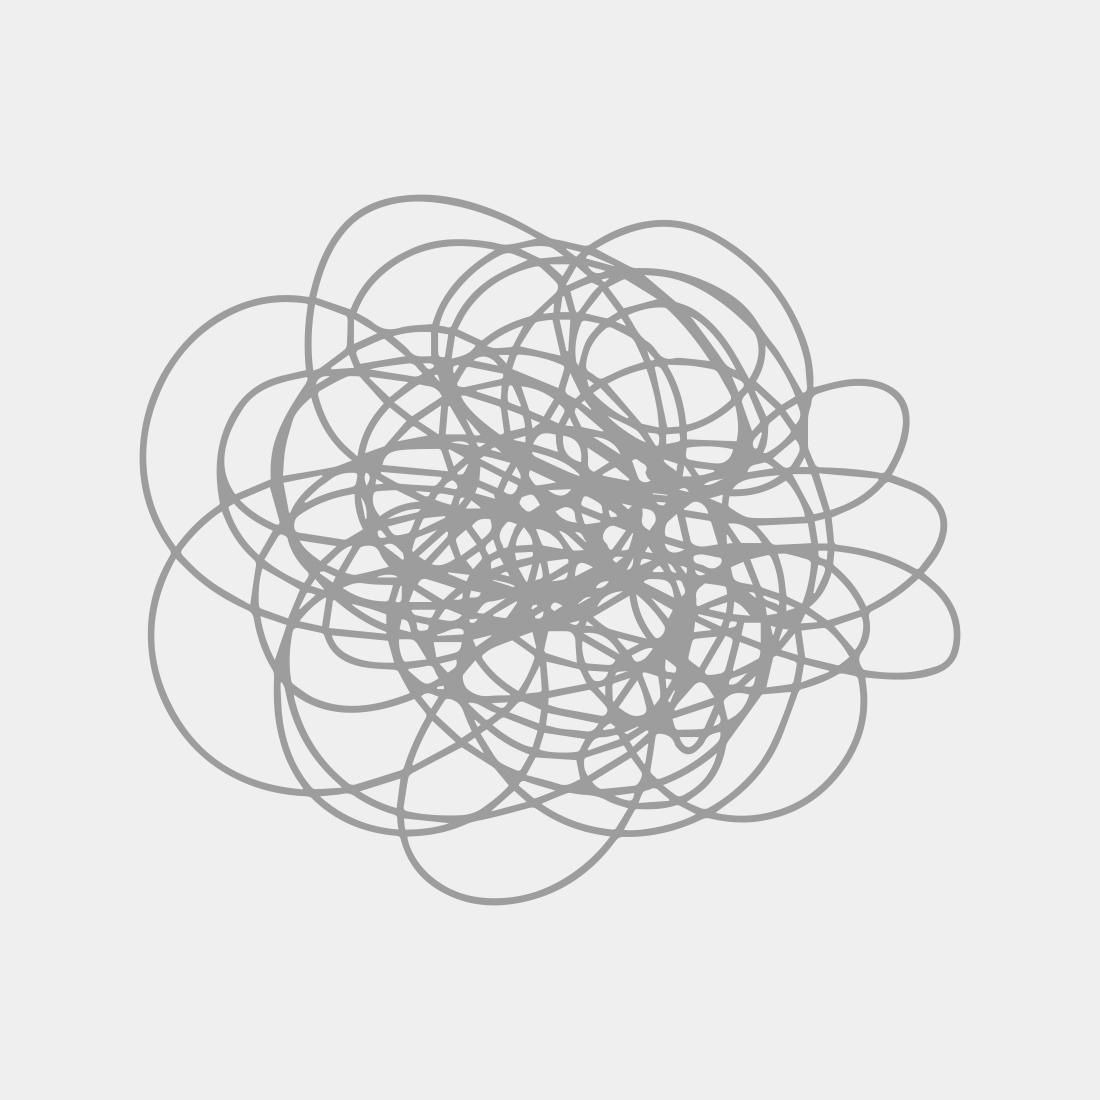 Meet the Artists Pre-Raphaelites